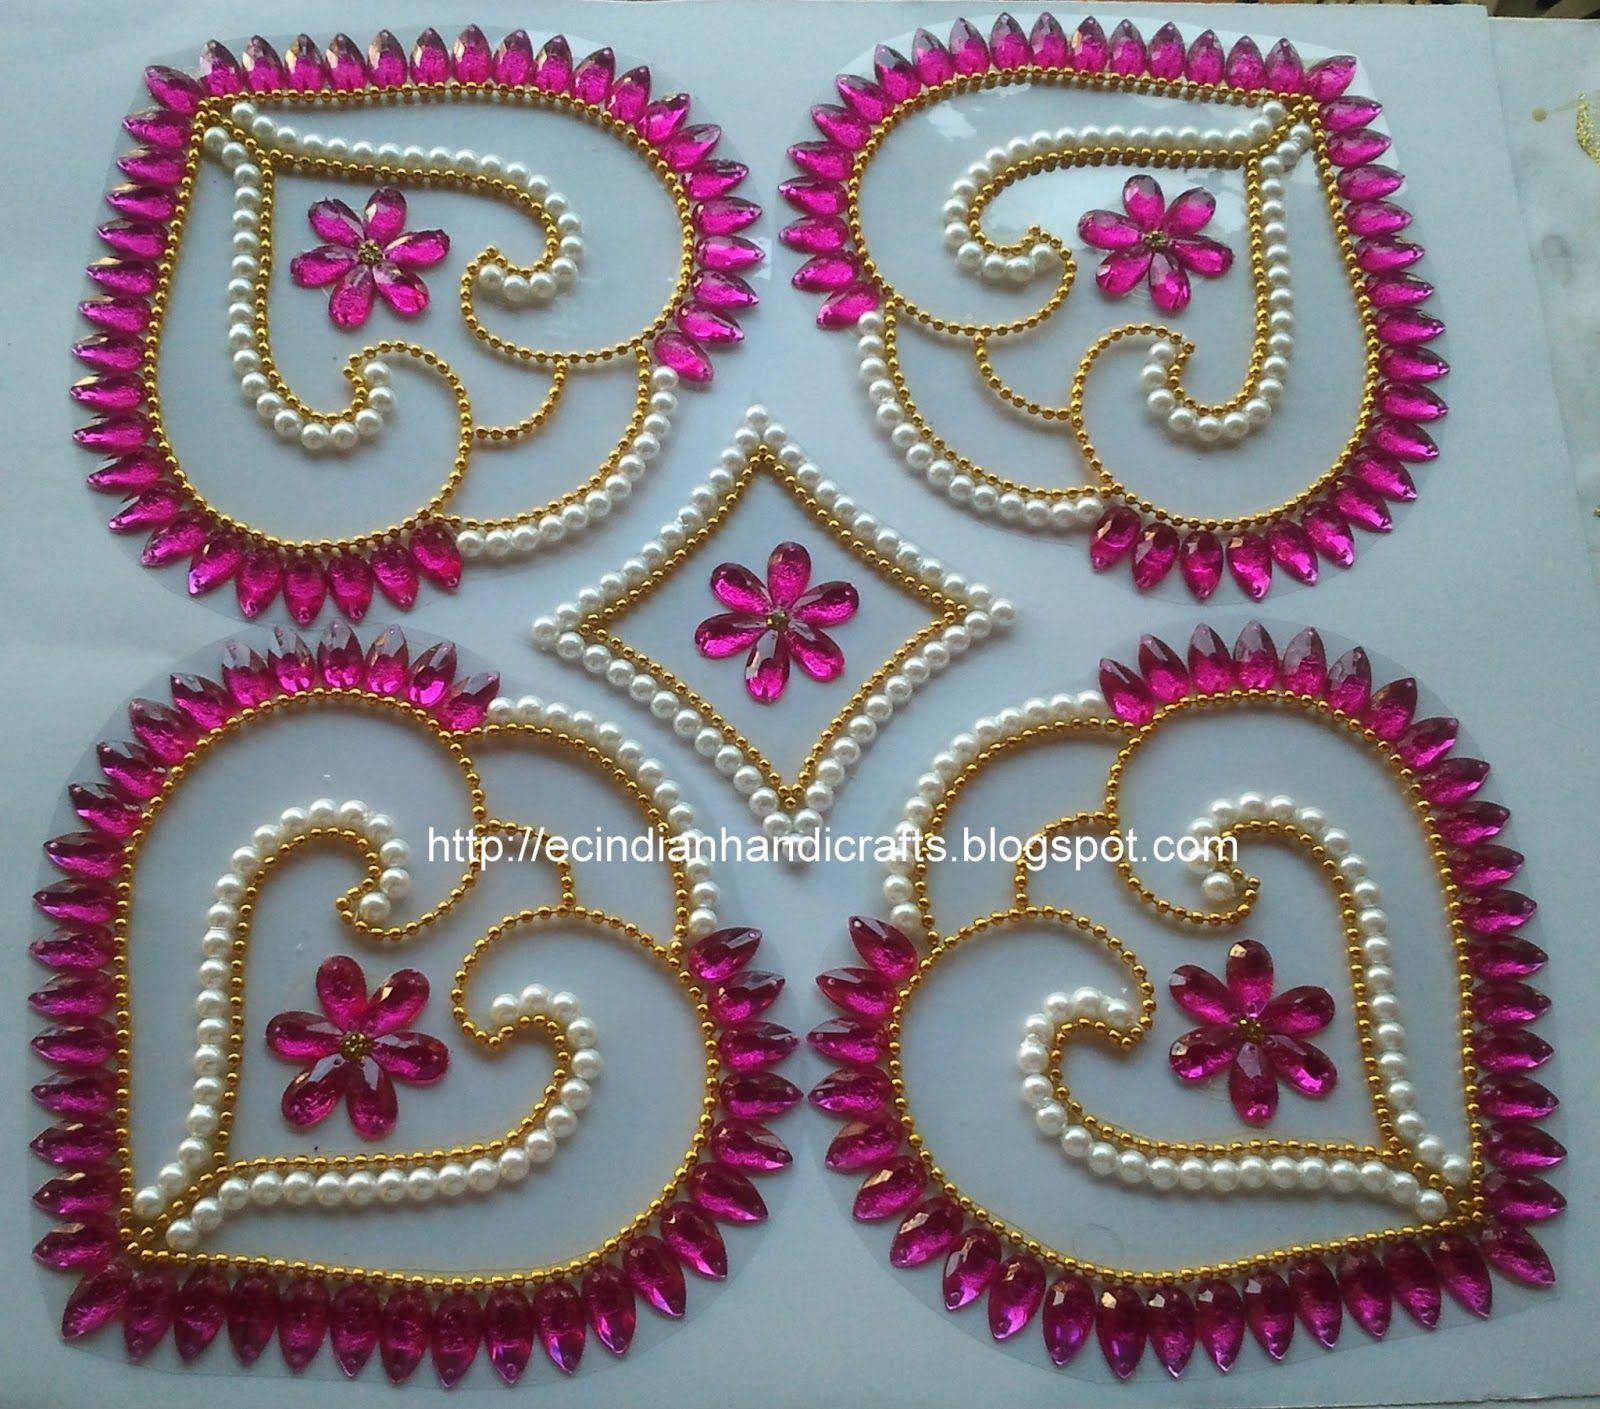 Shell Designs Ec Indian Handicrafts Customised Kundan Rangolis Double Shell